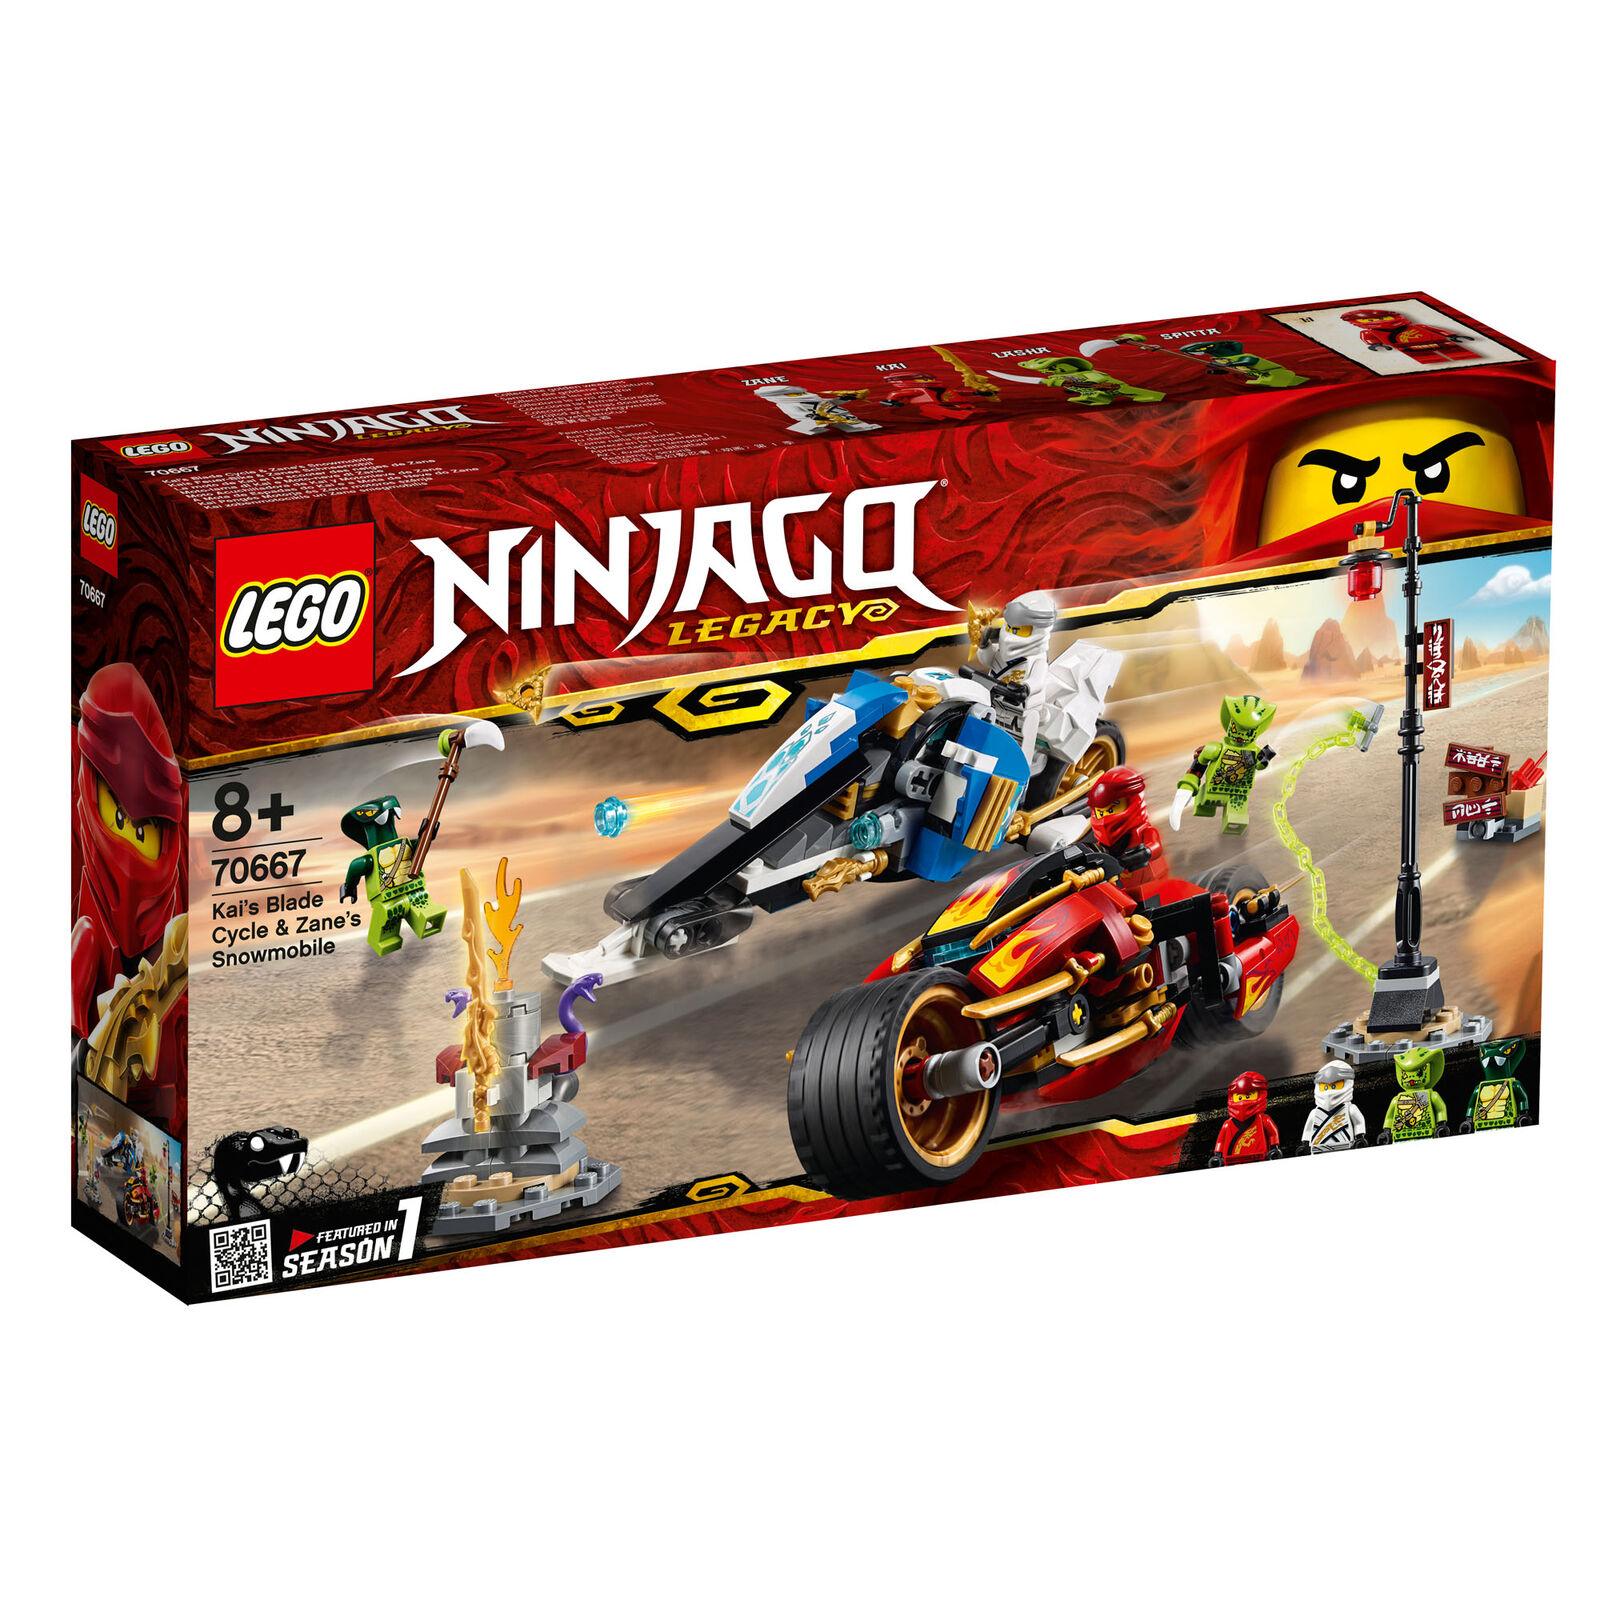 70667 LEGO Ninjago Kai's Blade Cycle & Zane's Snowmobile 376 Pieces Age 8+ 2019